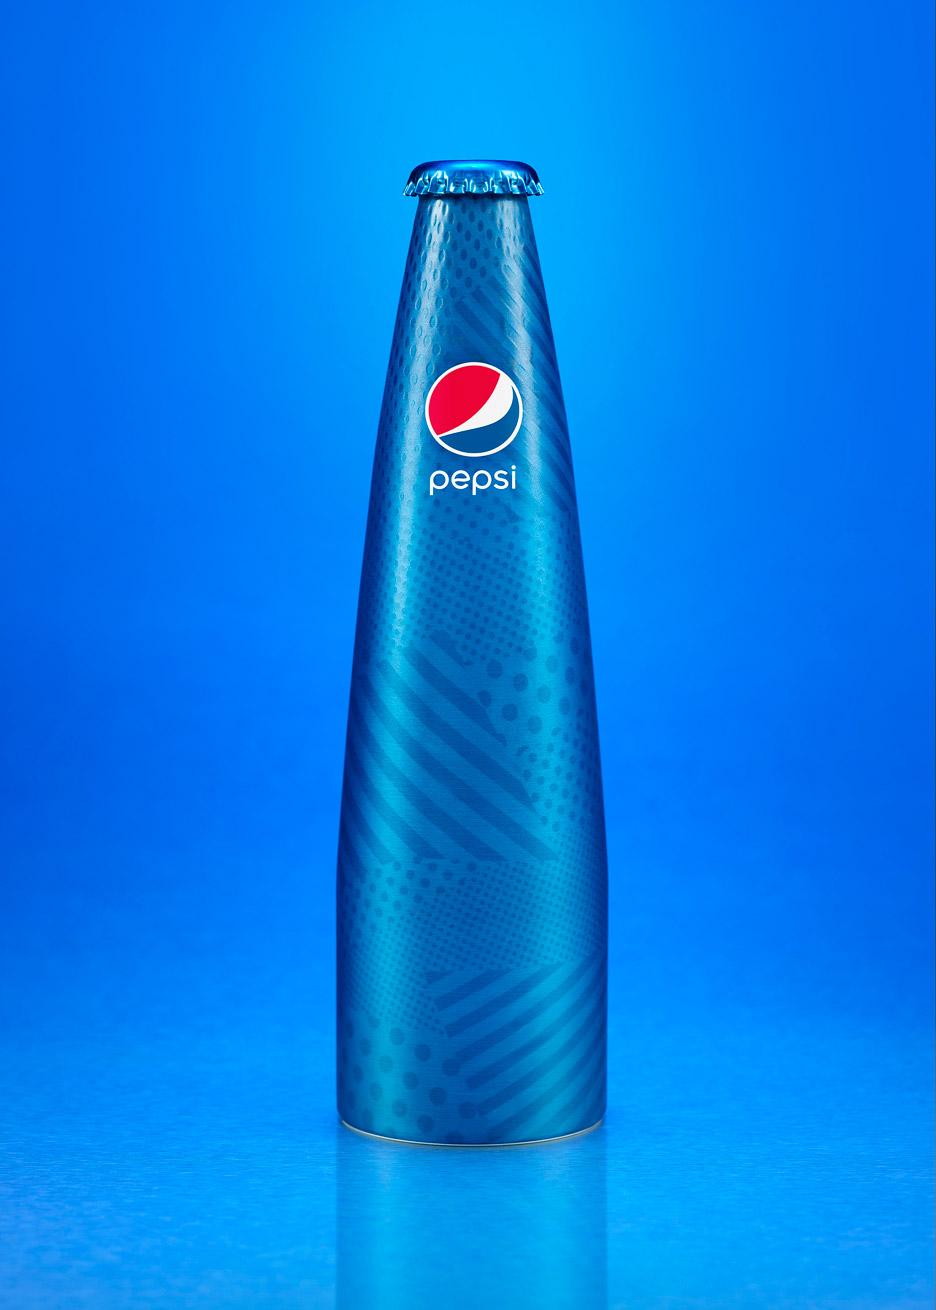 prestige-pepsi-bottle-karim-rashid-product-design-milan-design-week-2016_dezeen_936_6